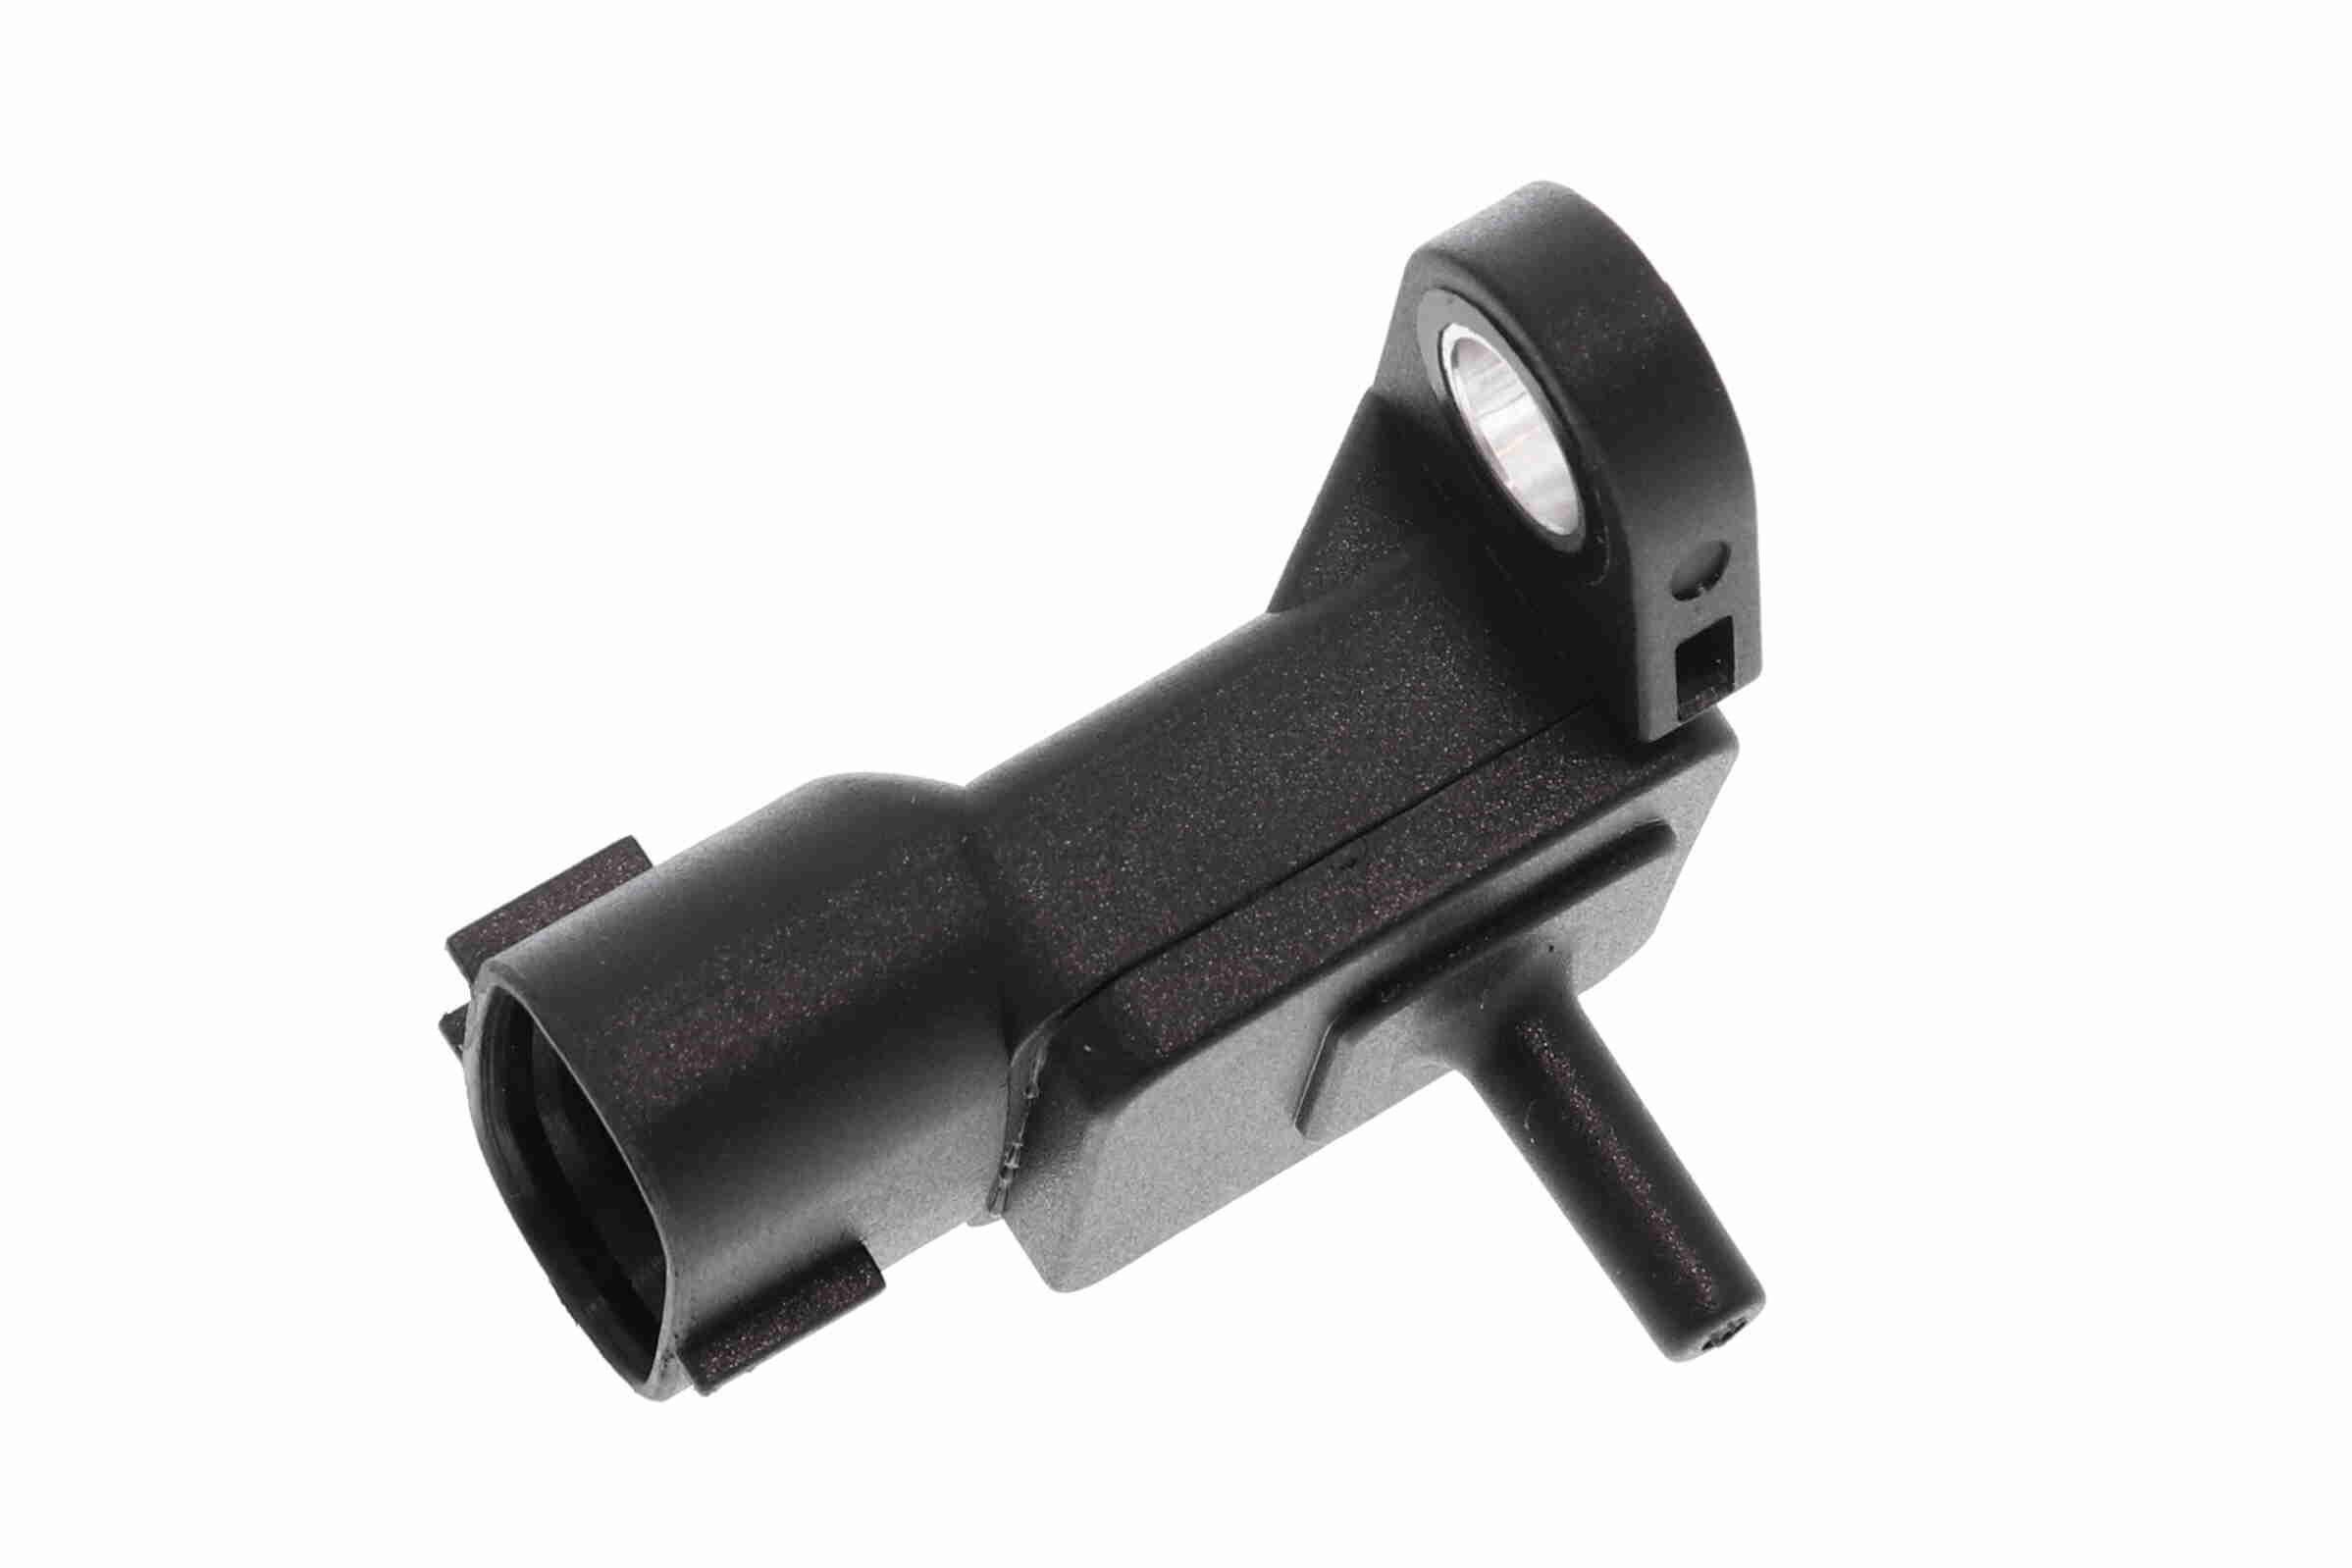 LEXUS IS 2016 Saugrohrdrucksensor - Original VEMO V63-72-0005